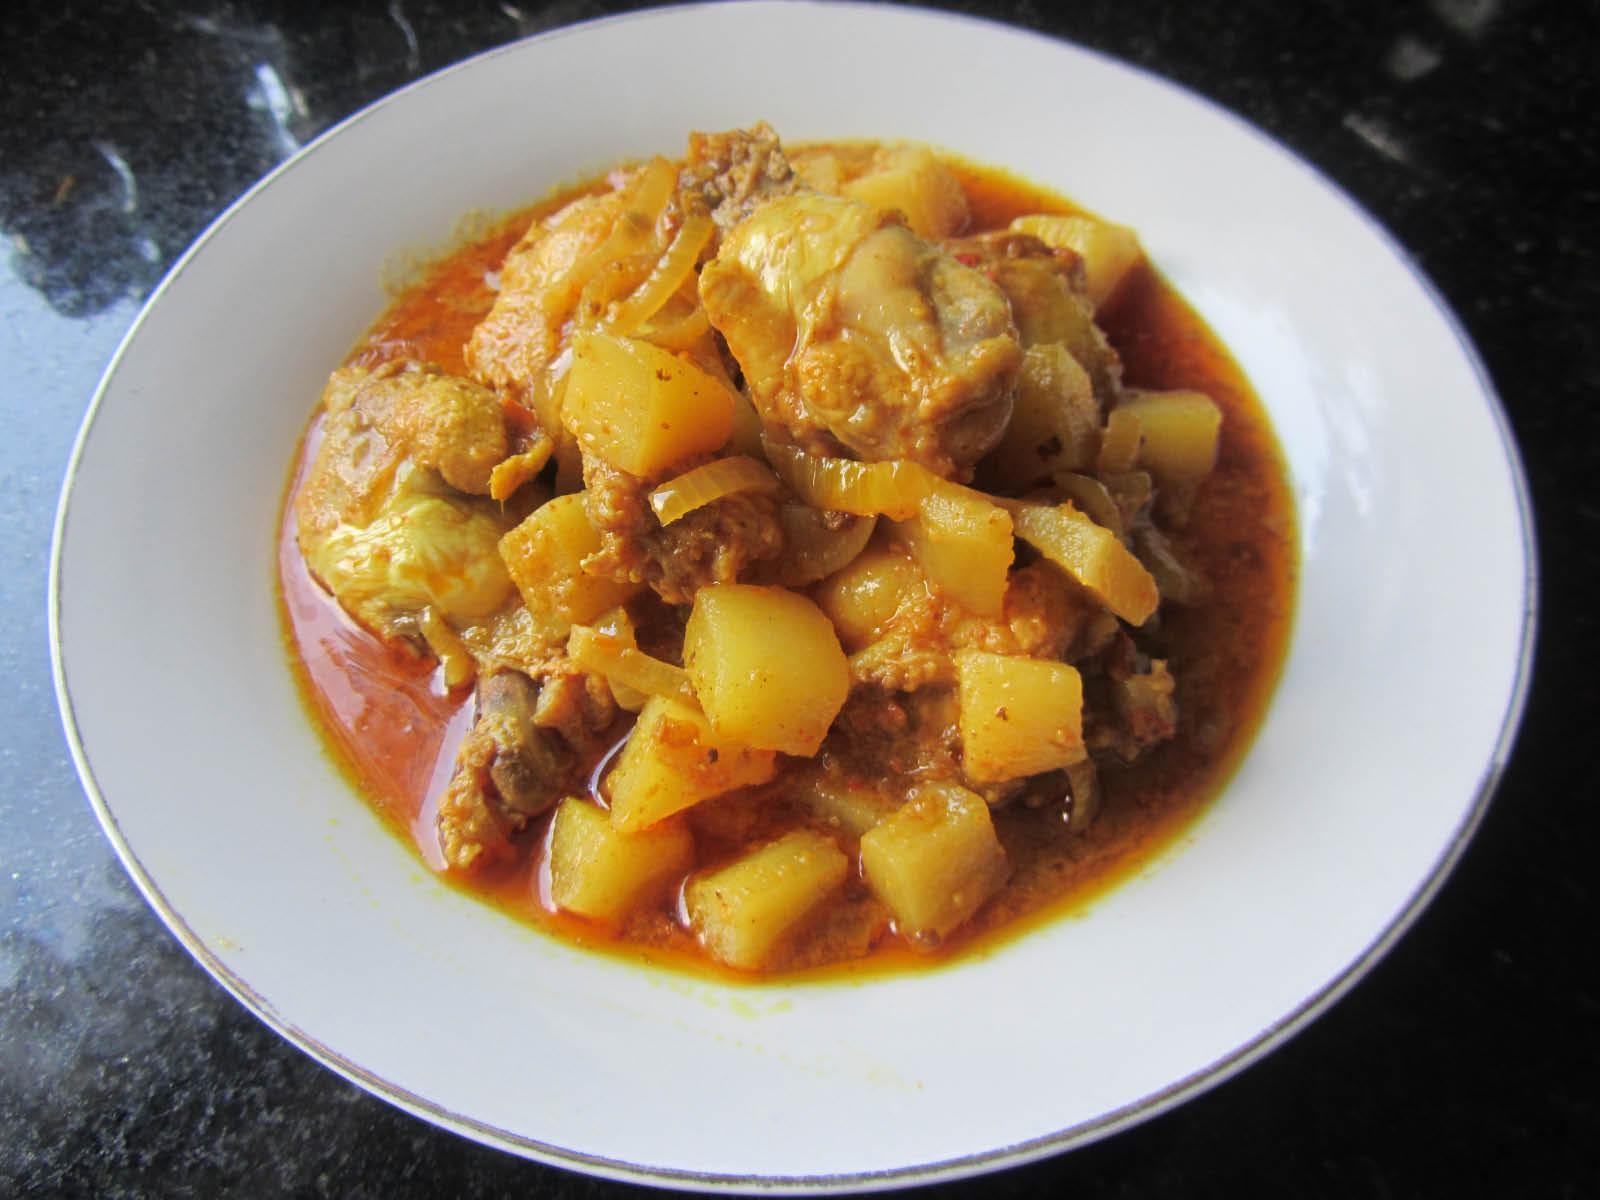 Chicken Vindaloo entrée at Mehran Indian Restaurant in Newark CA